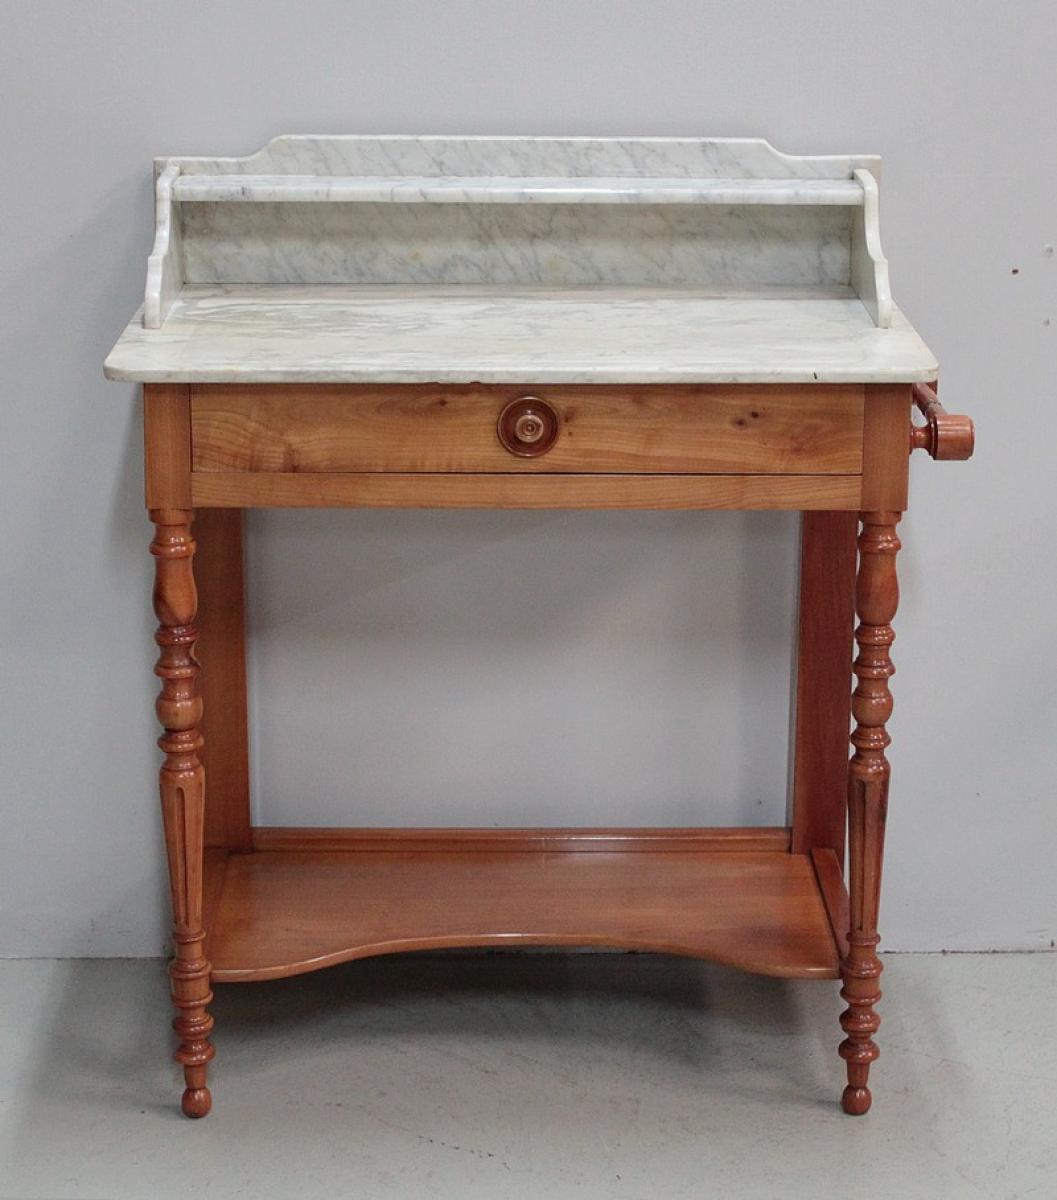 table de toilette en merisier massif 1920 antiquites lecomte. Black Bedroom Furniture Sets. Home Design Ideas